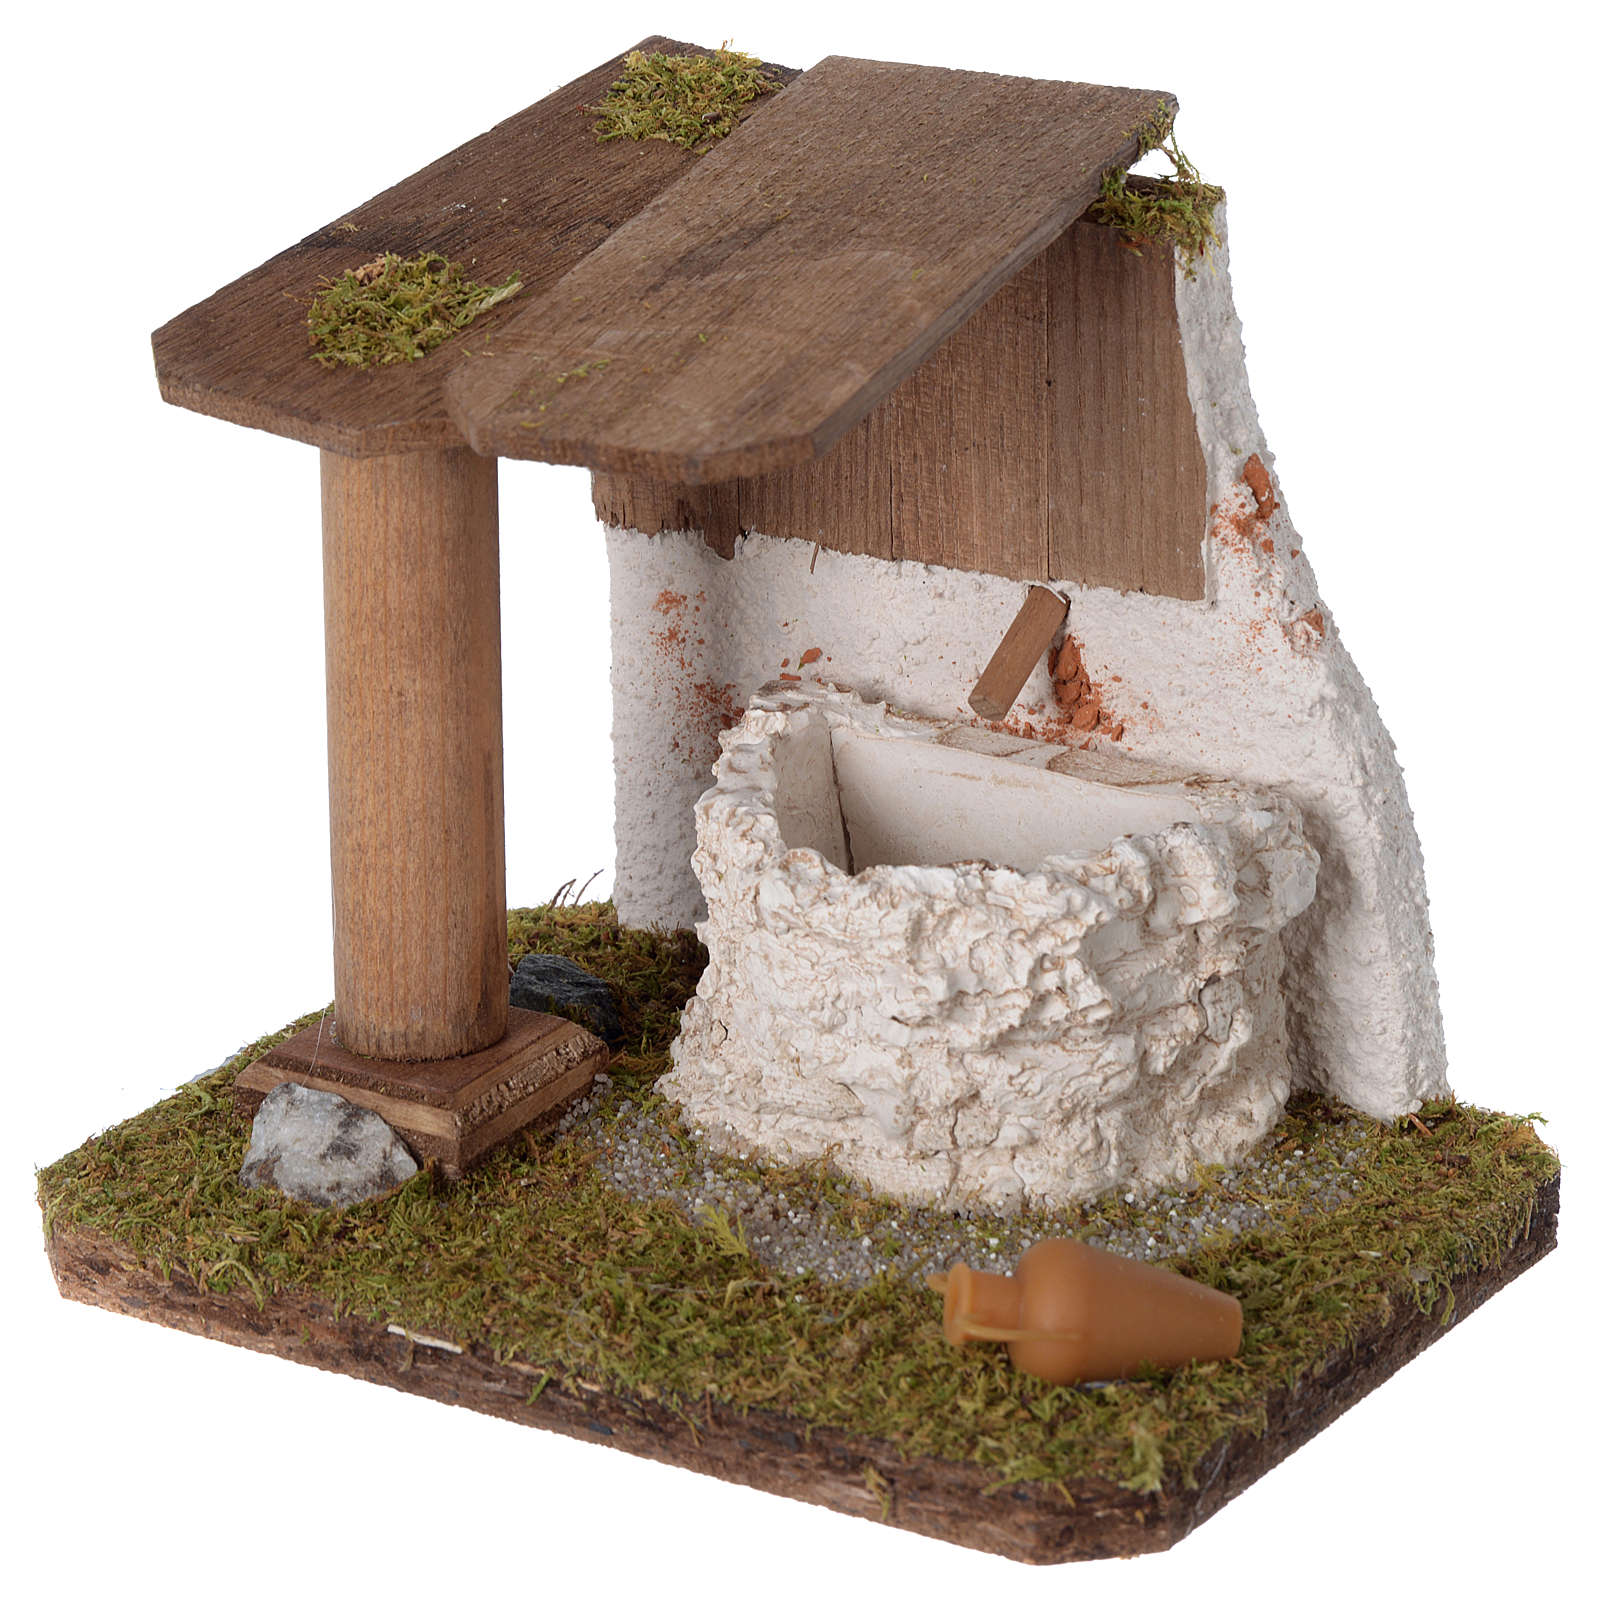 Fontana artigianale in legno e gesso 15x15x10 cm per presepe 10-12 cm 4